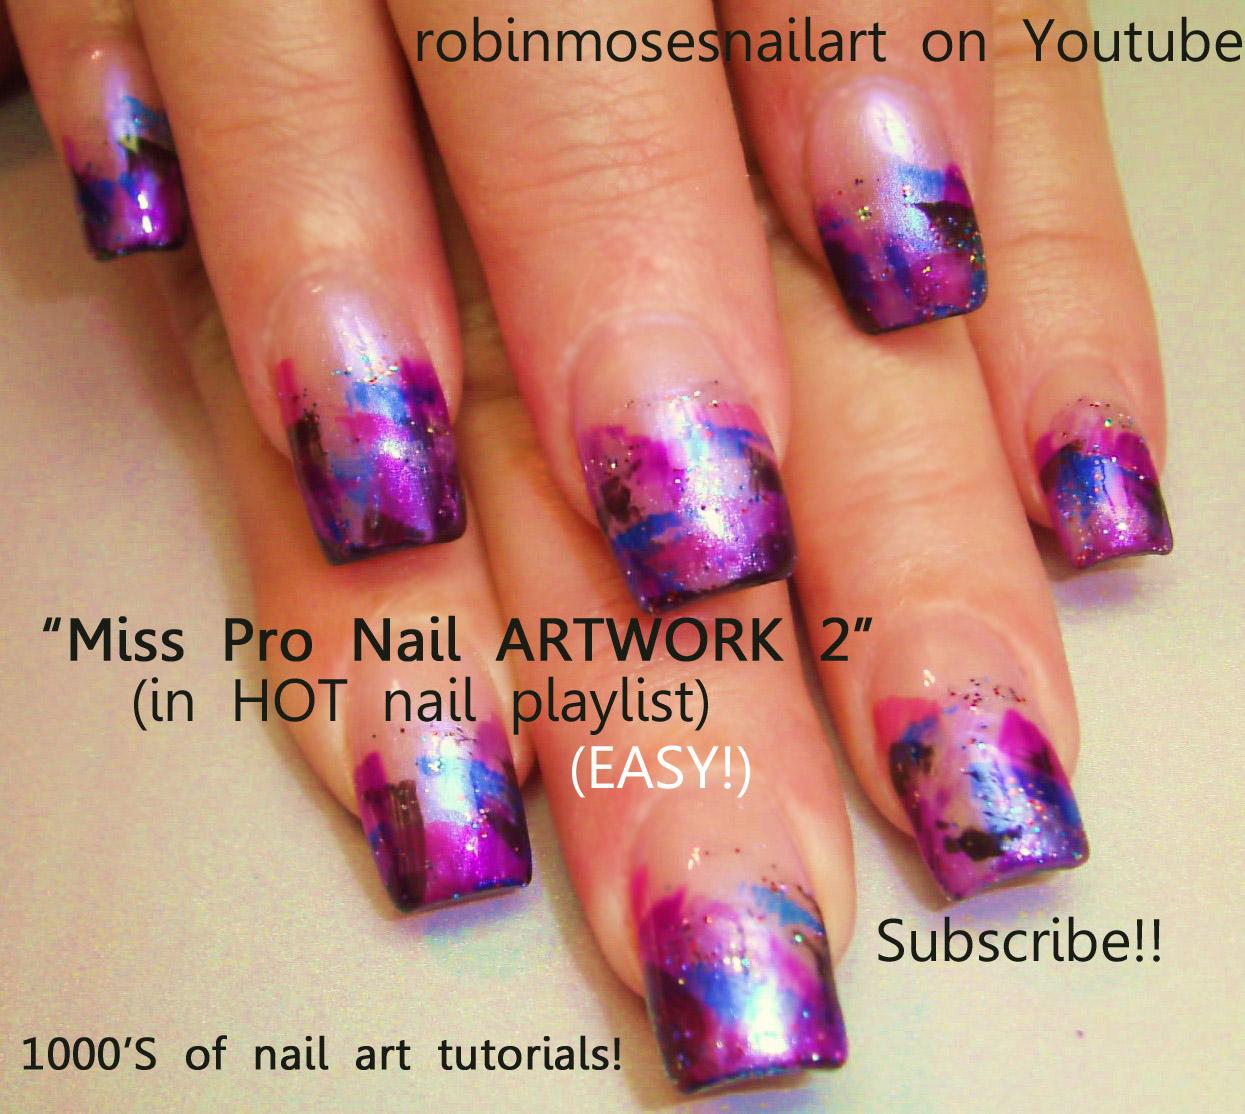 painting women, miss professional nail, miss pro artwork 1, miss pro ...